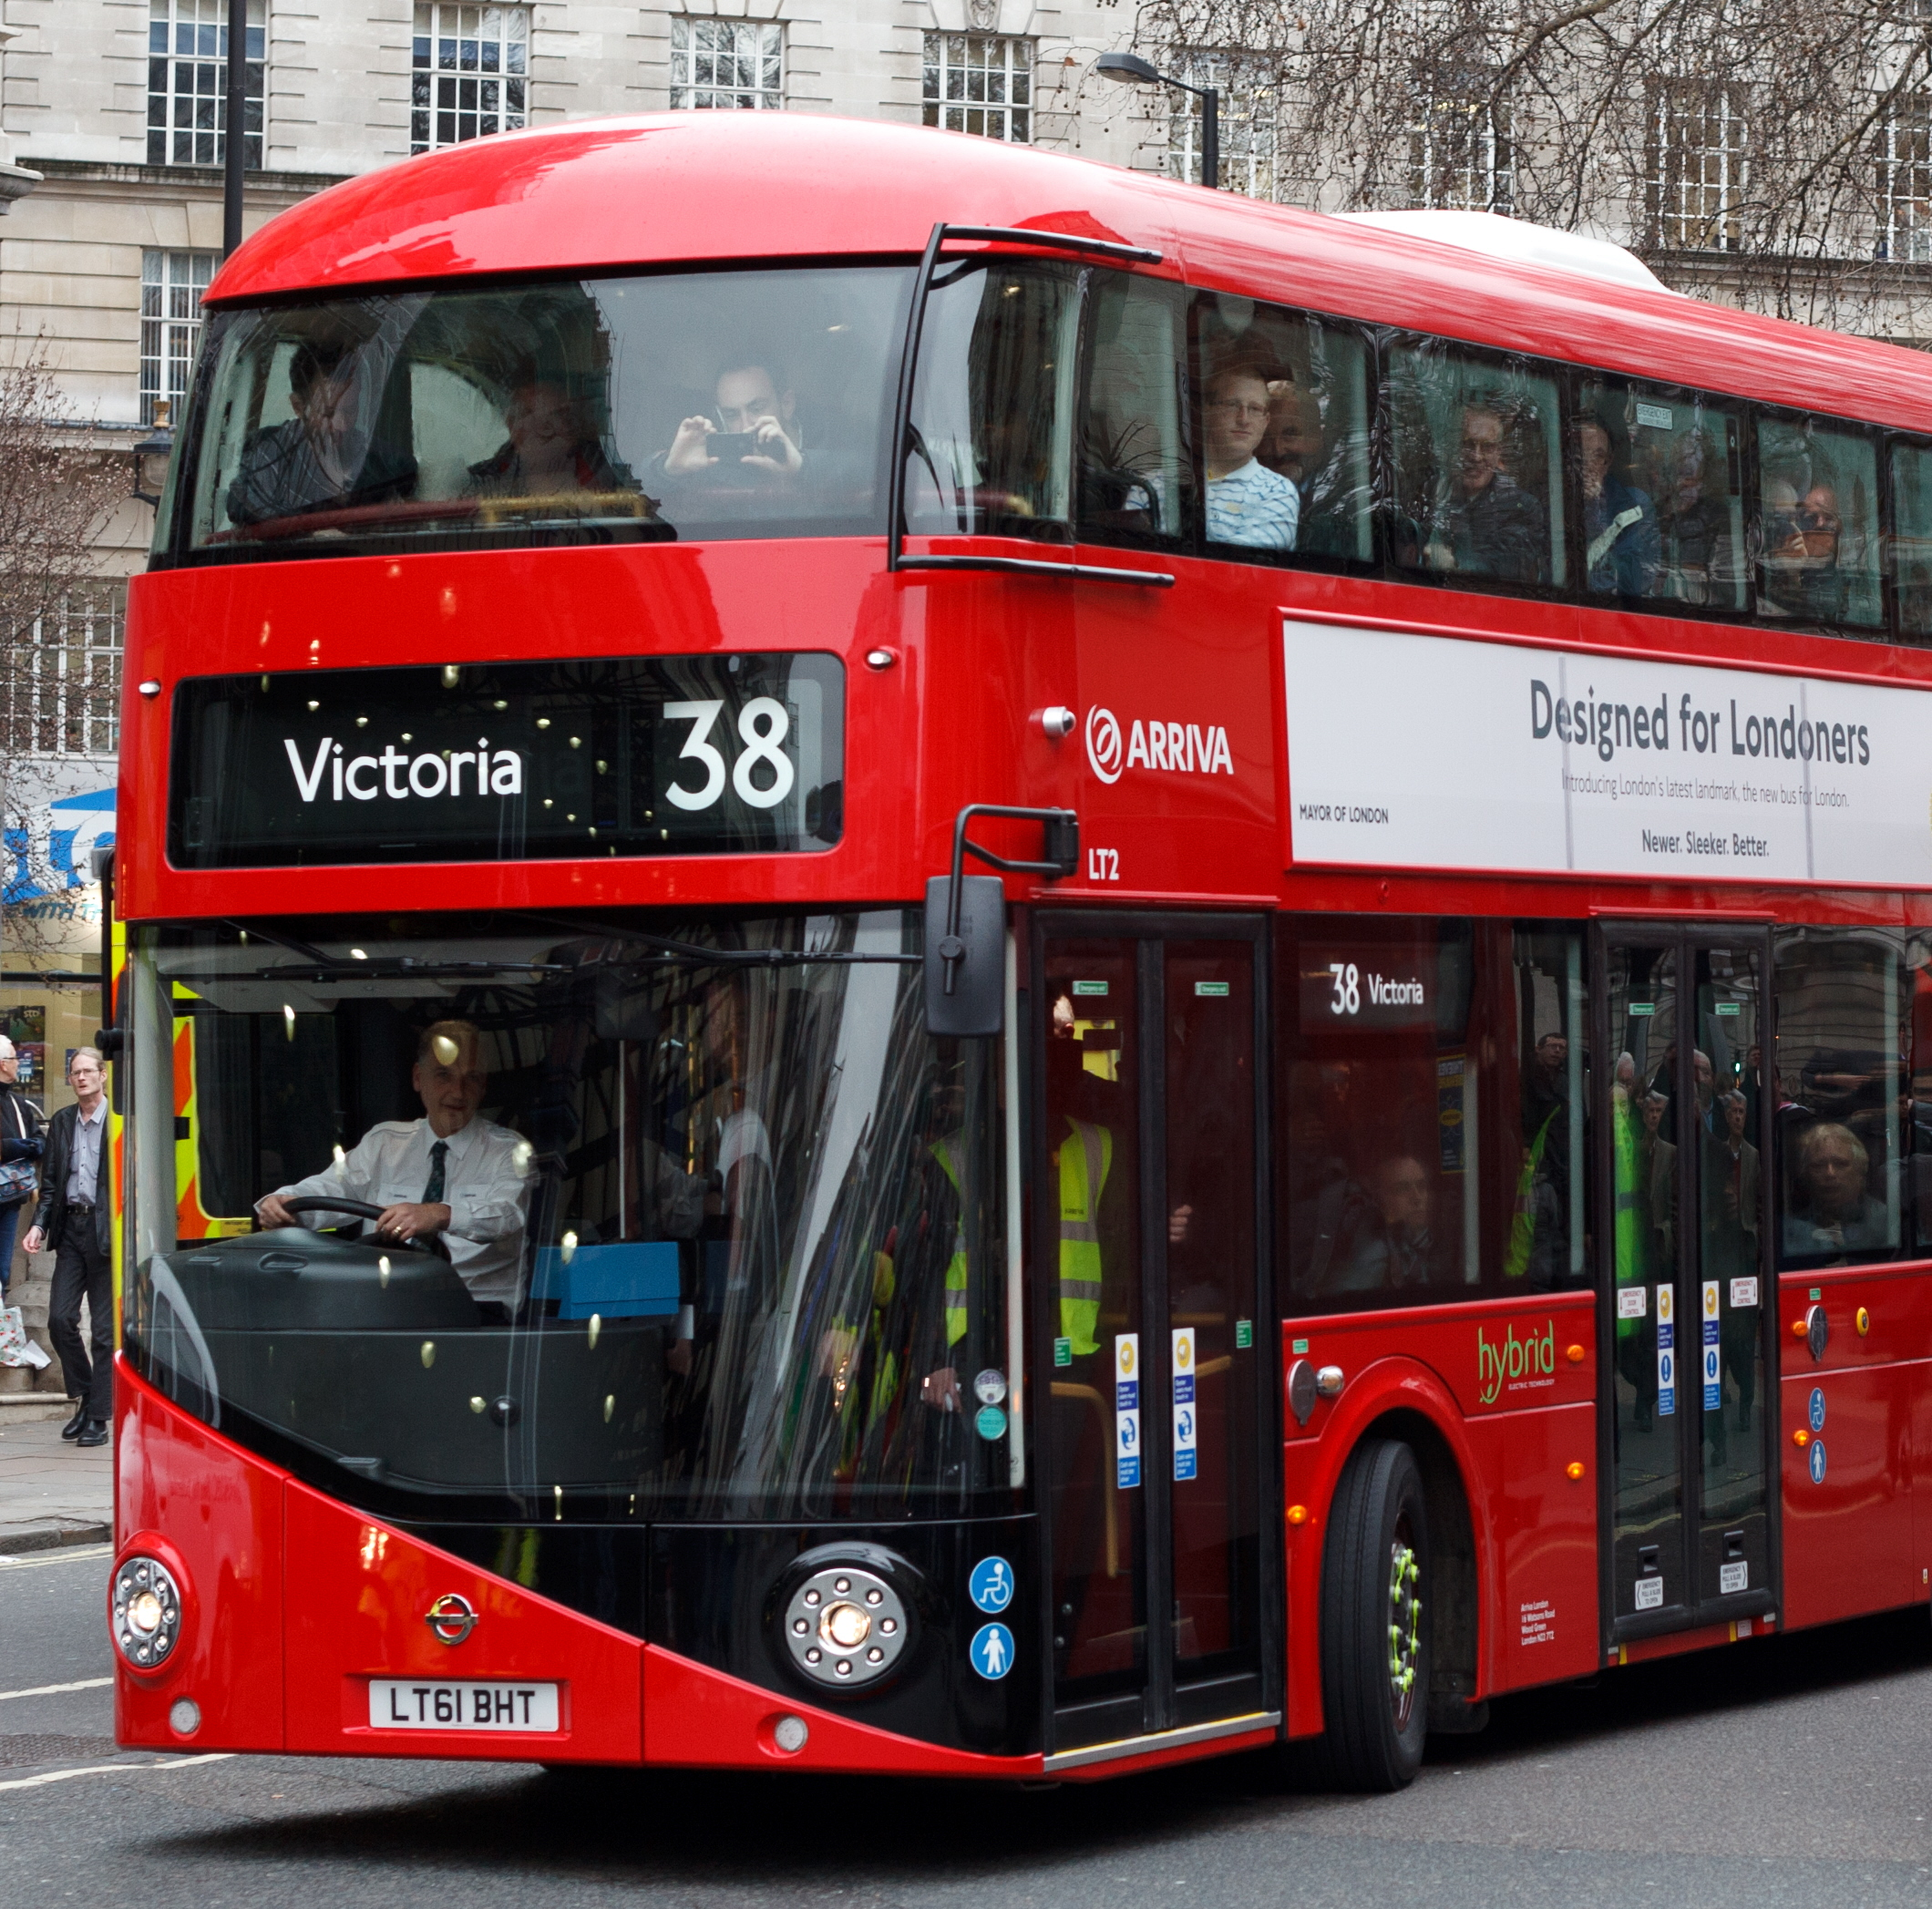 London Transport Museum - Ed Unloaded.com | Parenting ... |London Transit Buses